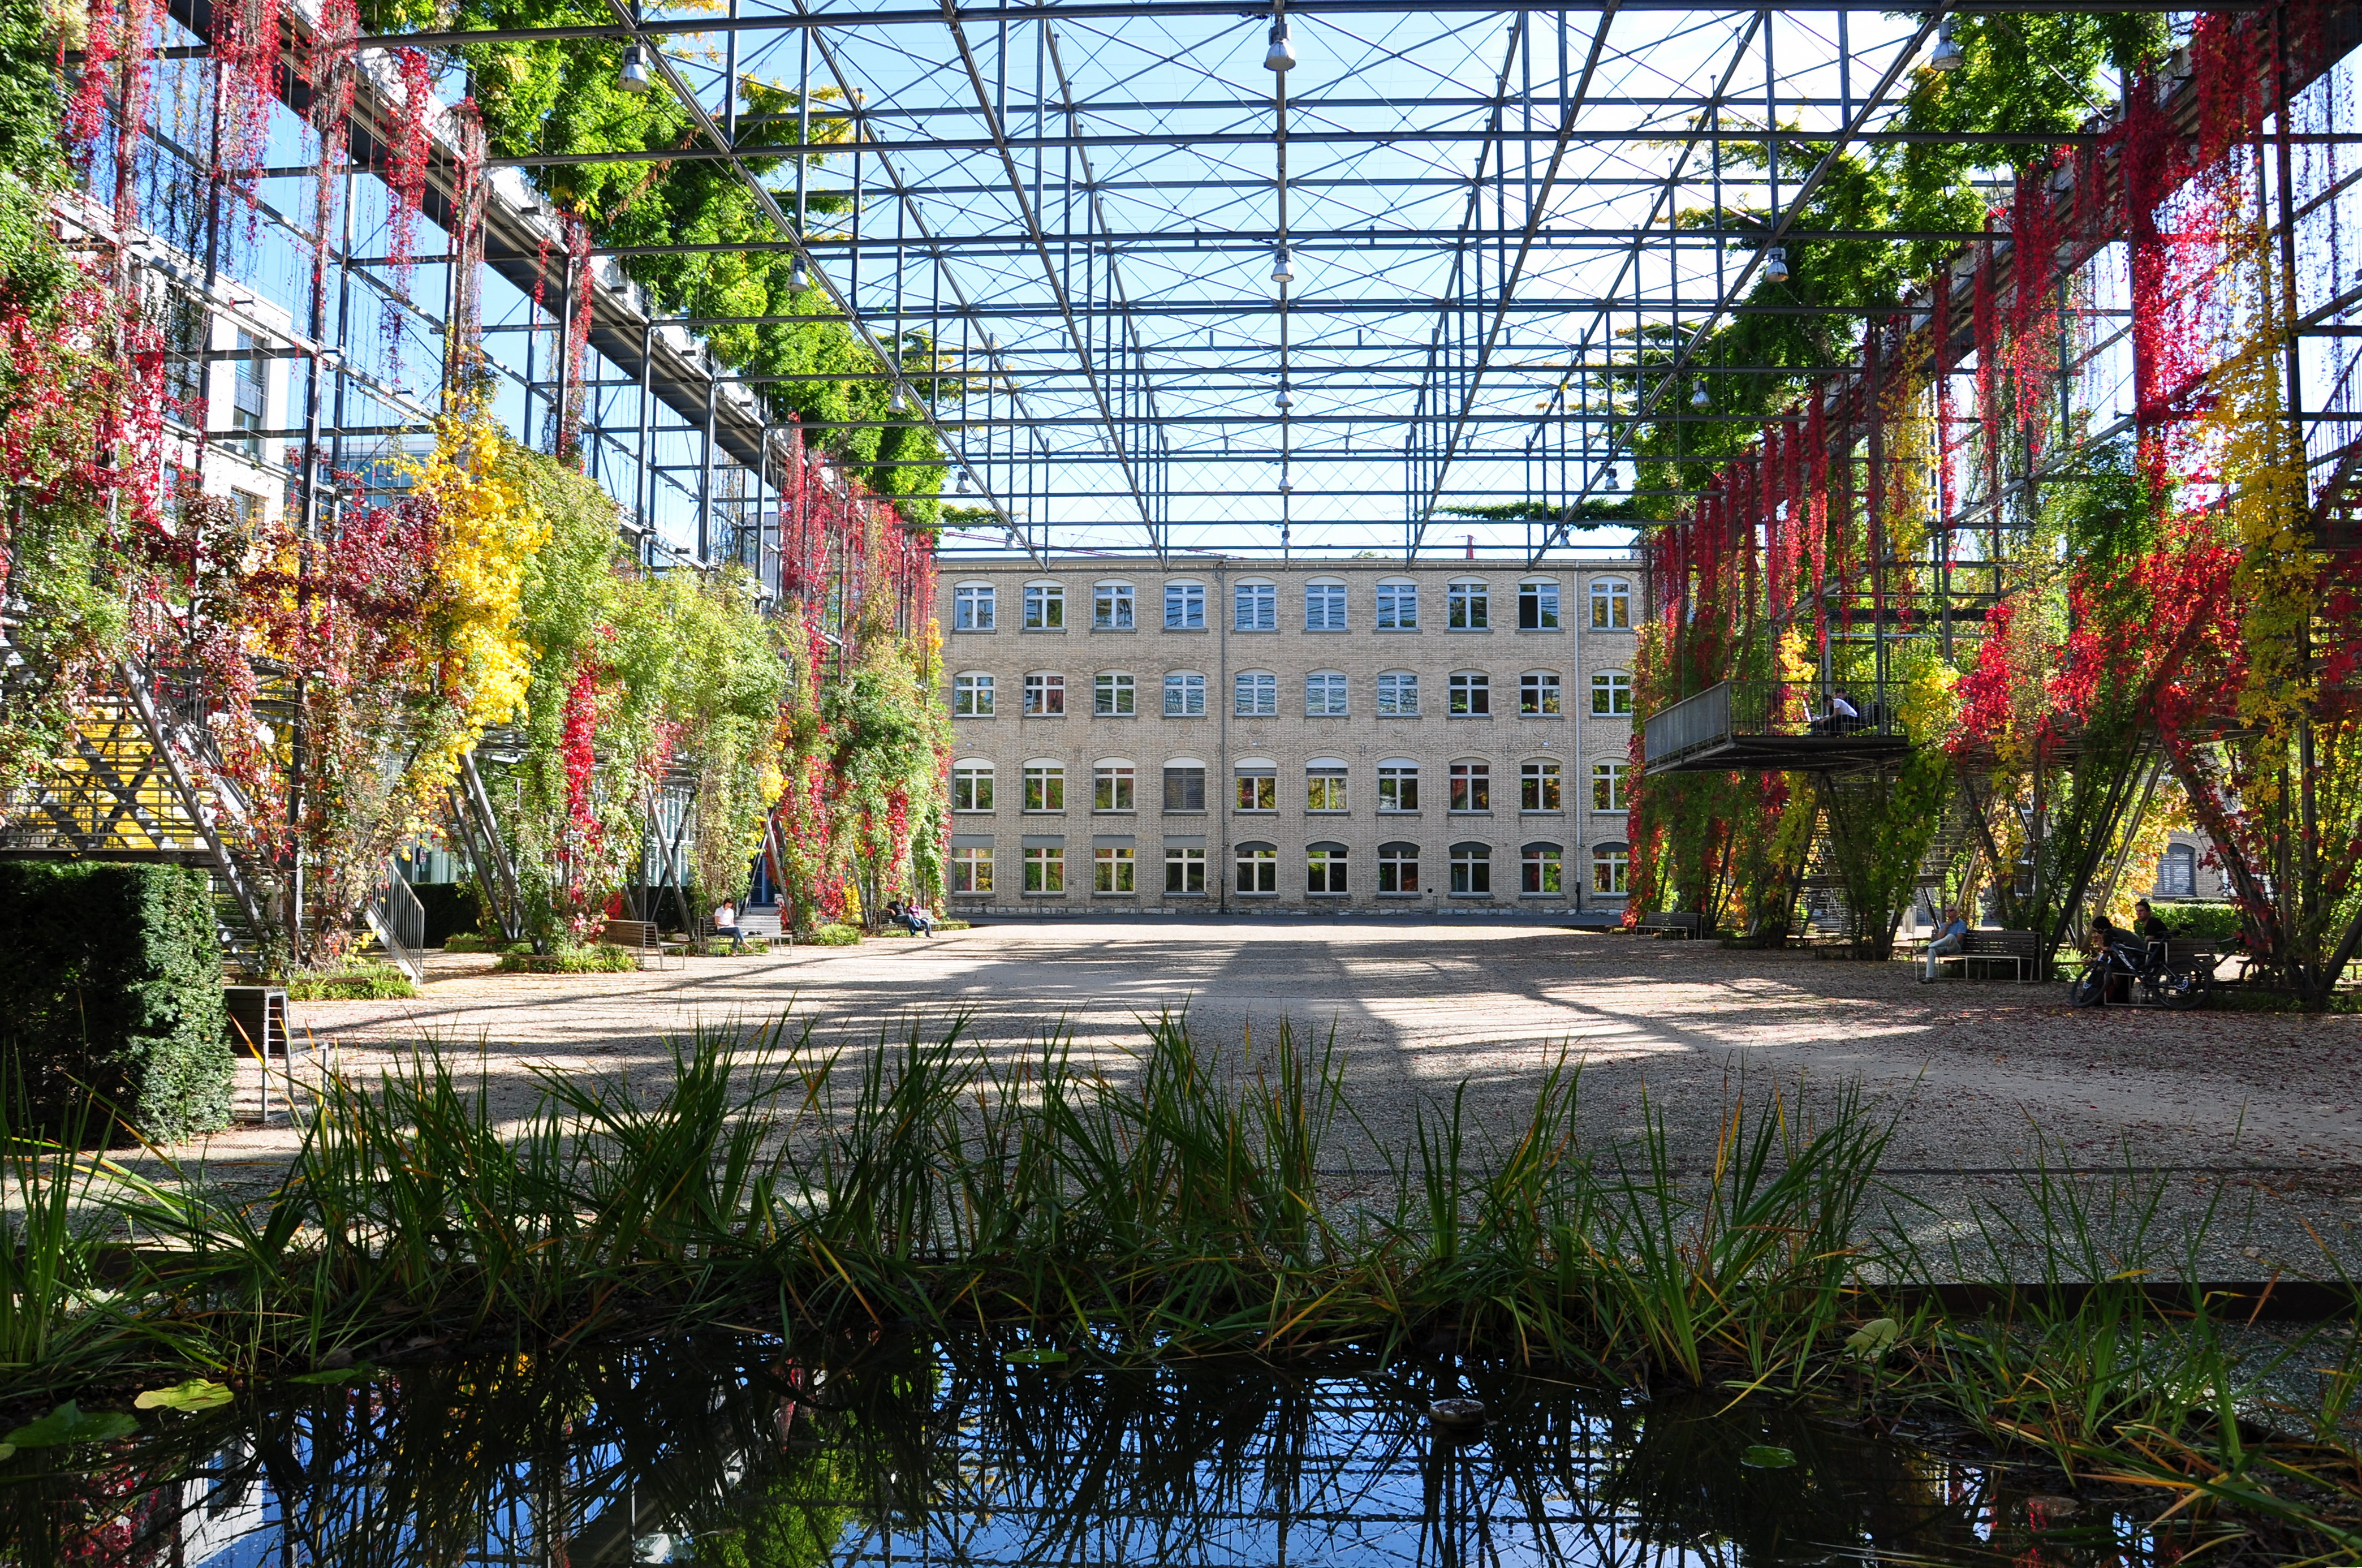 File:Zürich - Oerlikon - Maschinenfabrik Oerlikon (MFO ...